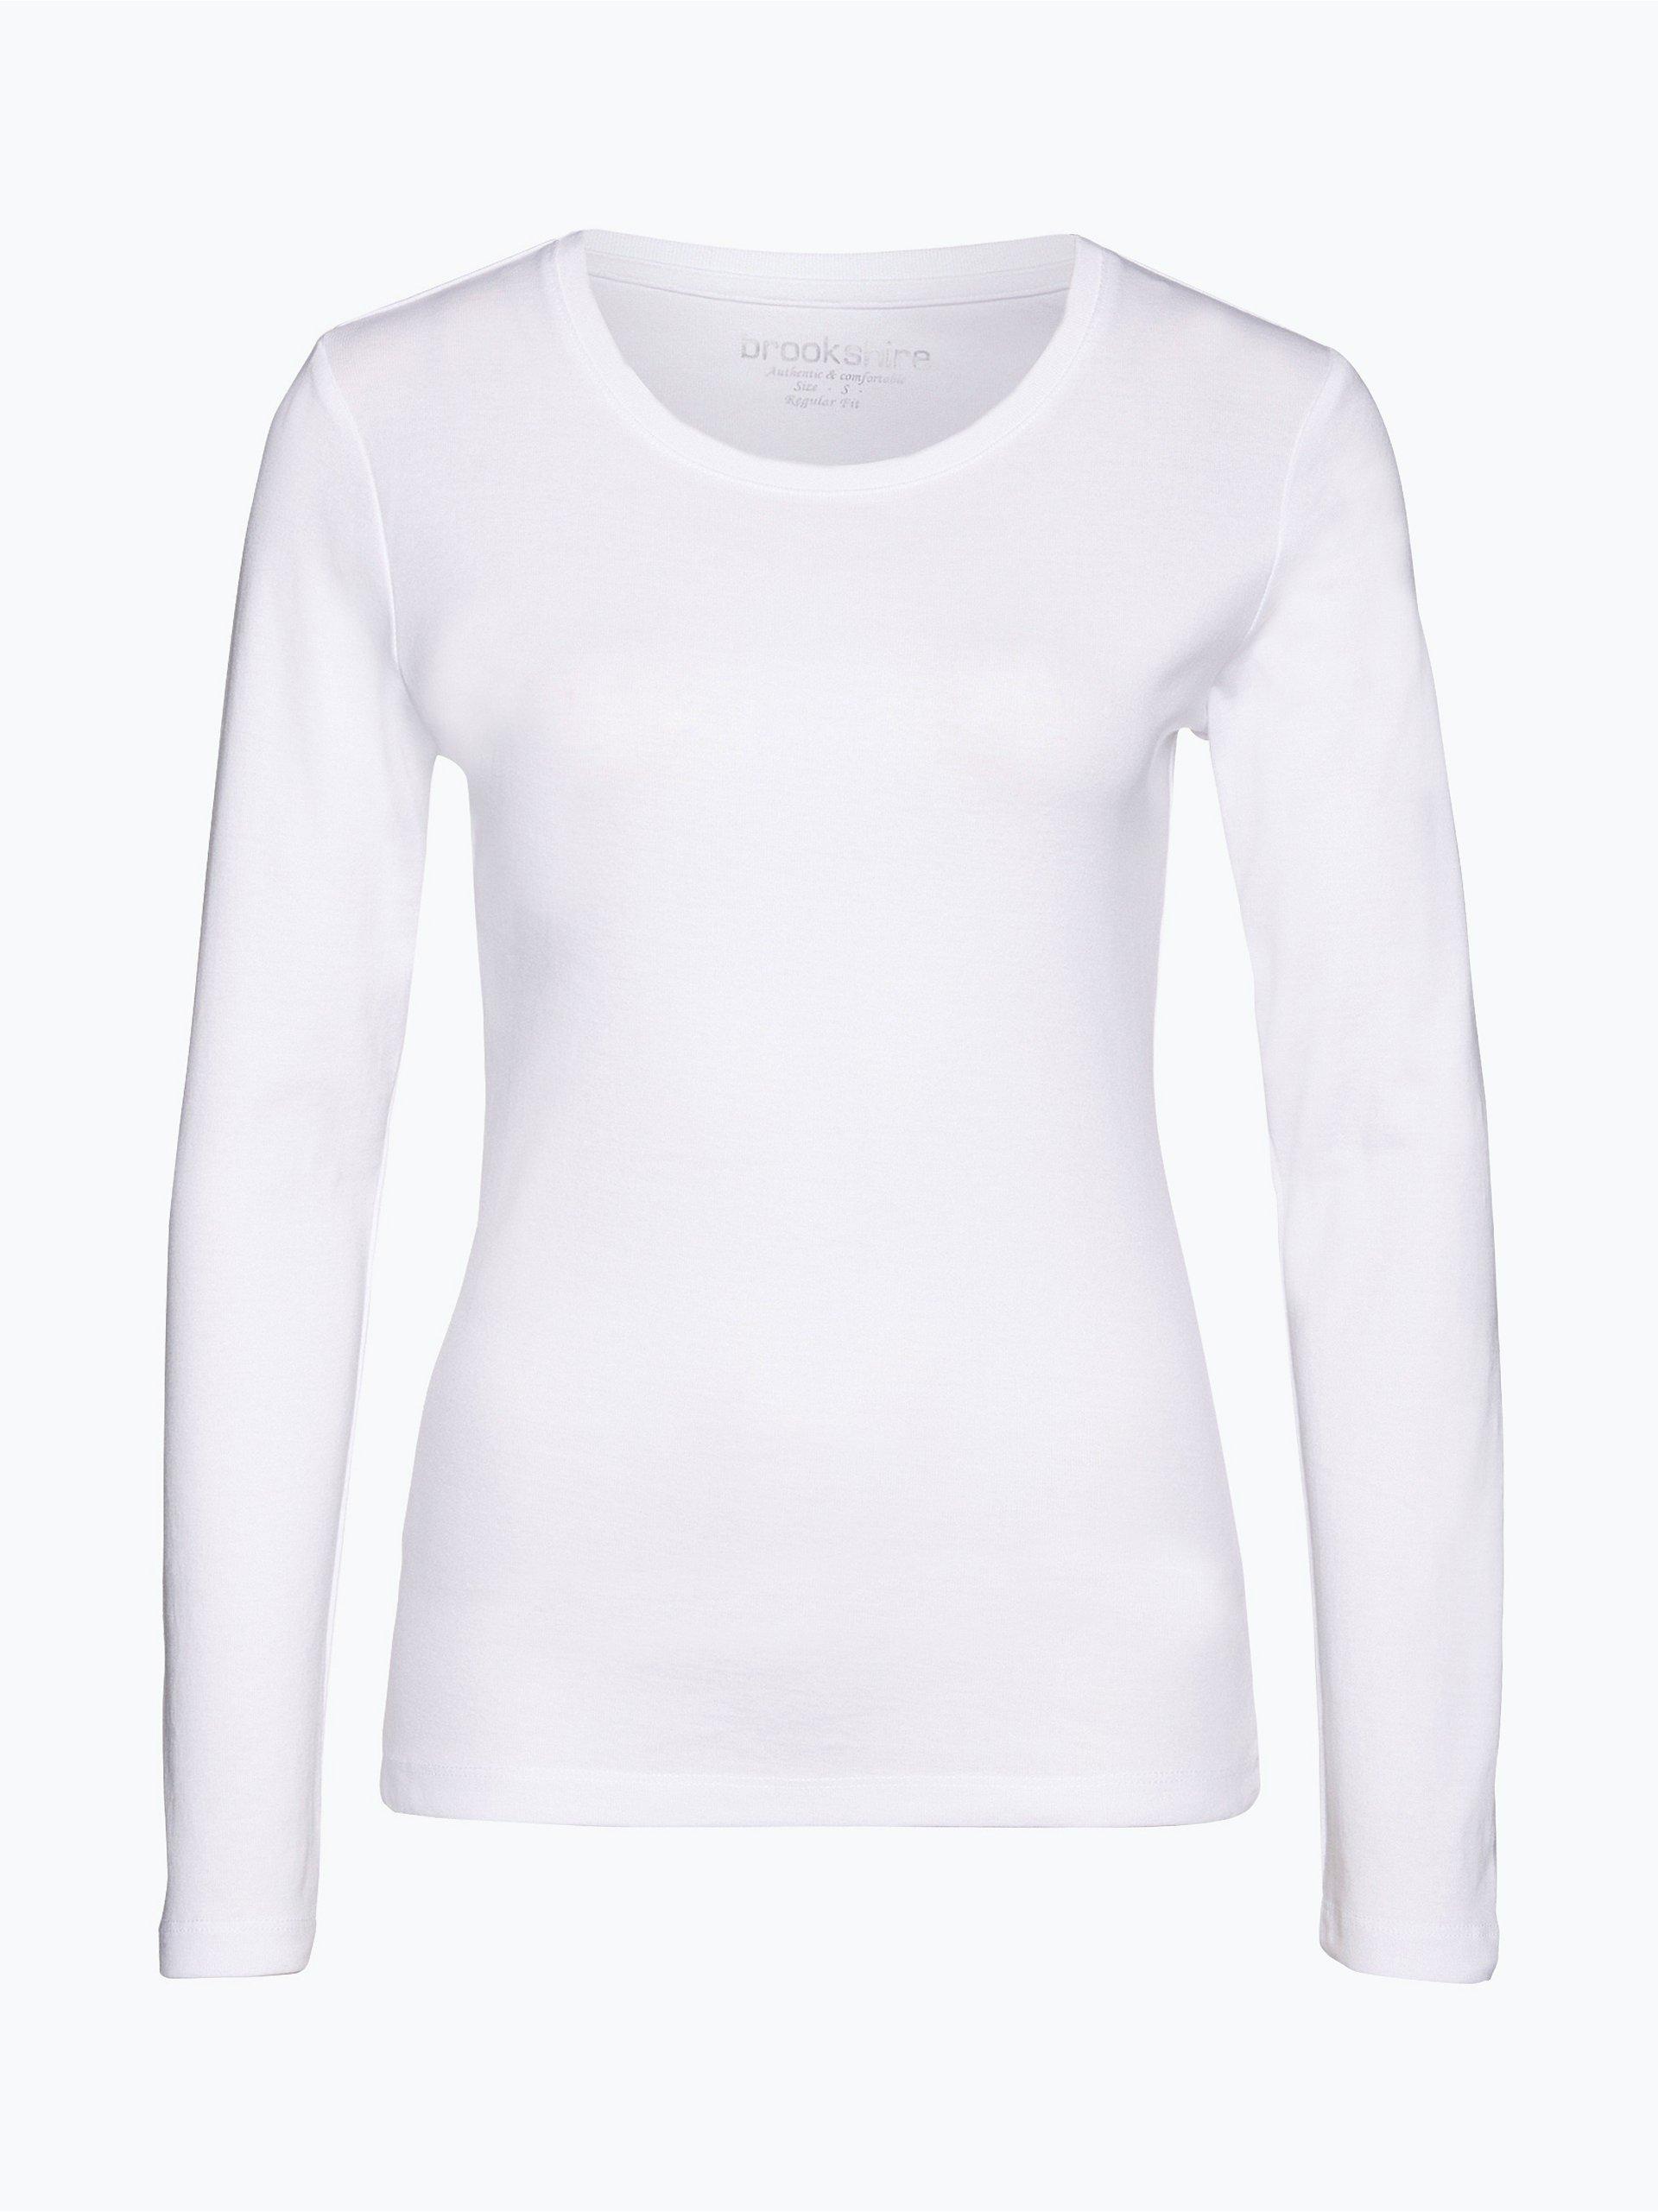 brookshire damen langarmshirt wei uni online kaufen. Black Bedroom Furniture Sets. Home Design Ideas